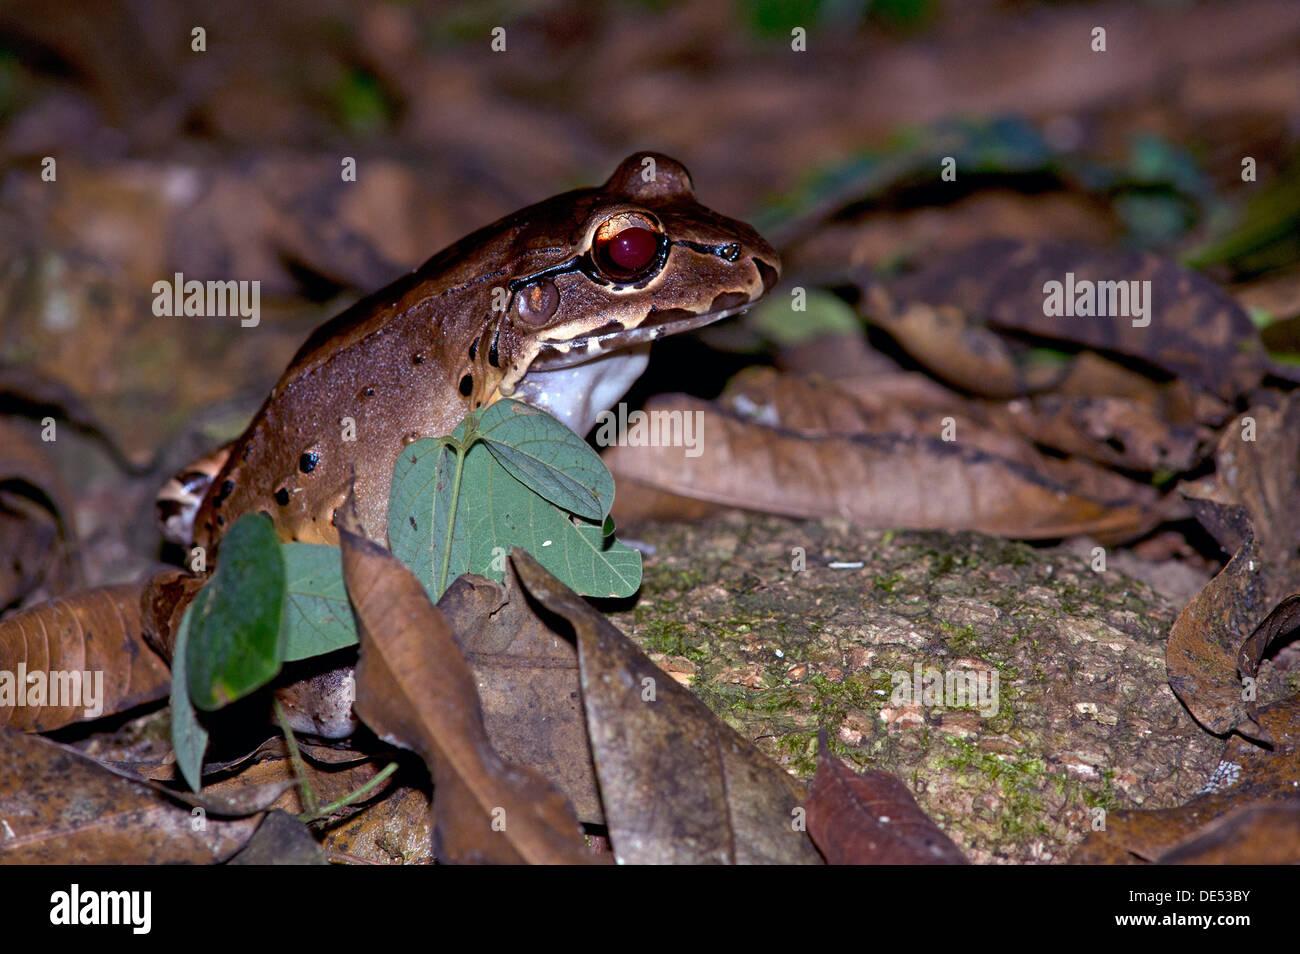 Savage's Thin-toed Frog (Leptodactylus savagei), Dos Brazos, Osa Peninsula, Puntarenas Province, Costa Rica, Central America - Stock Image